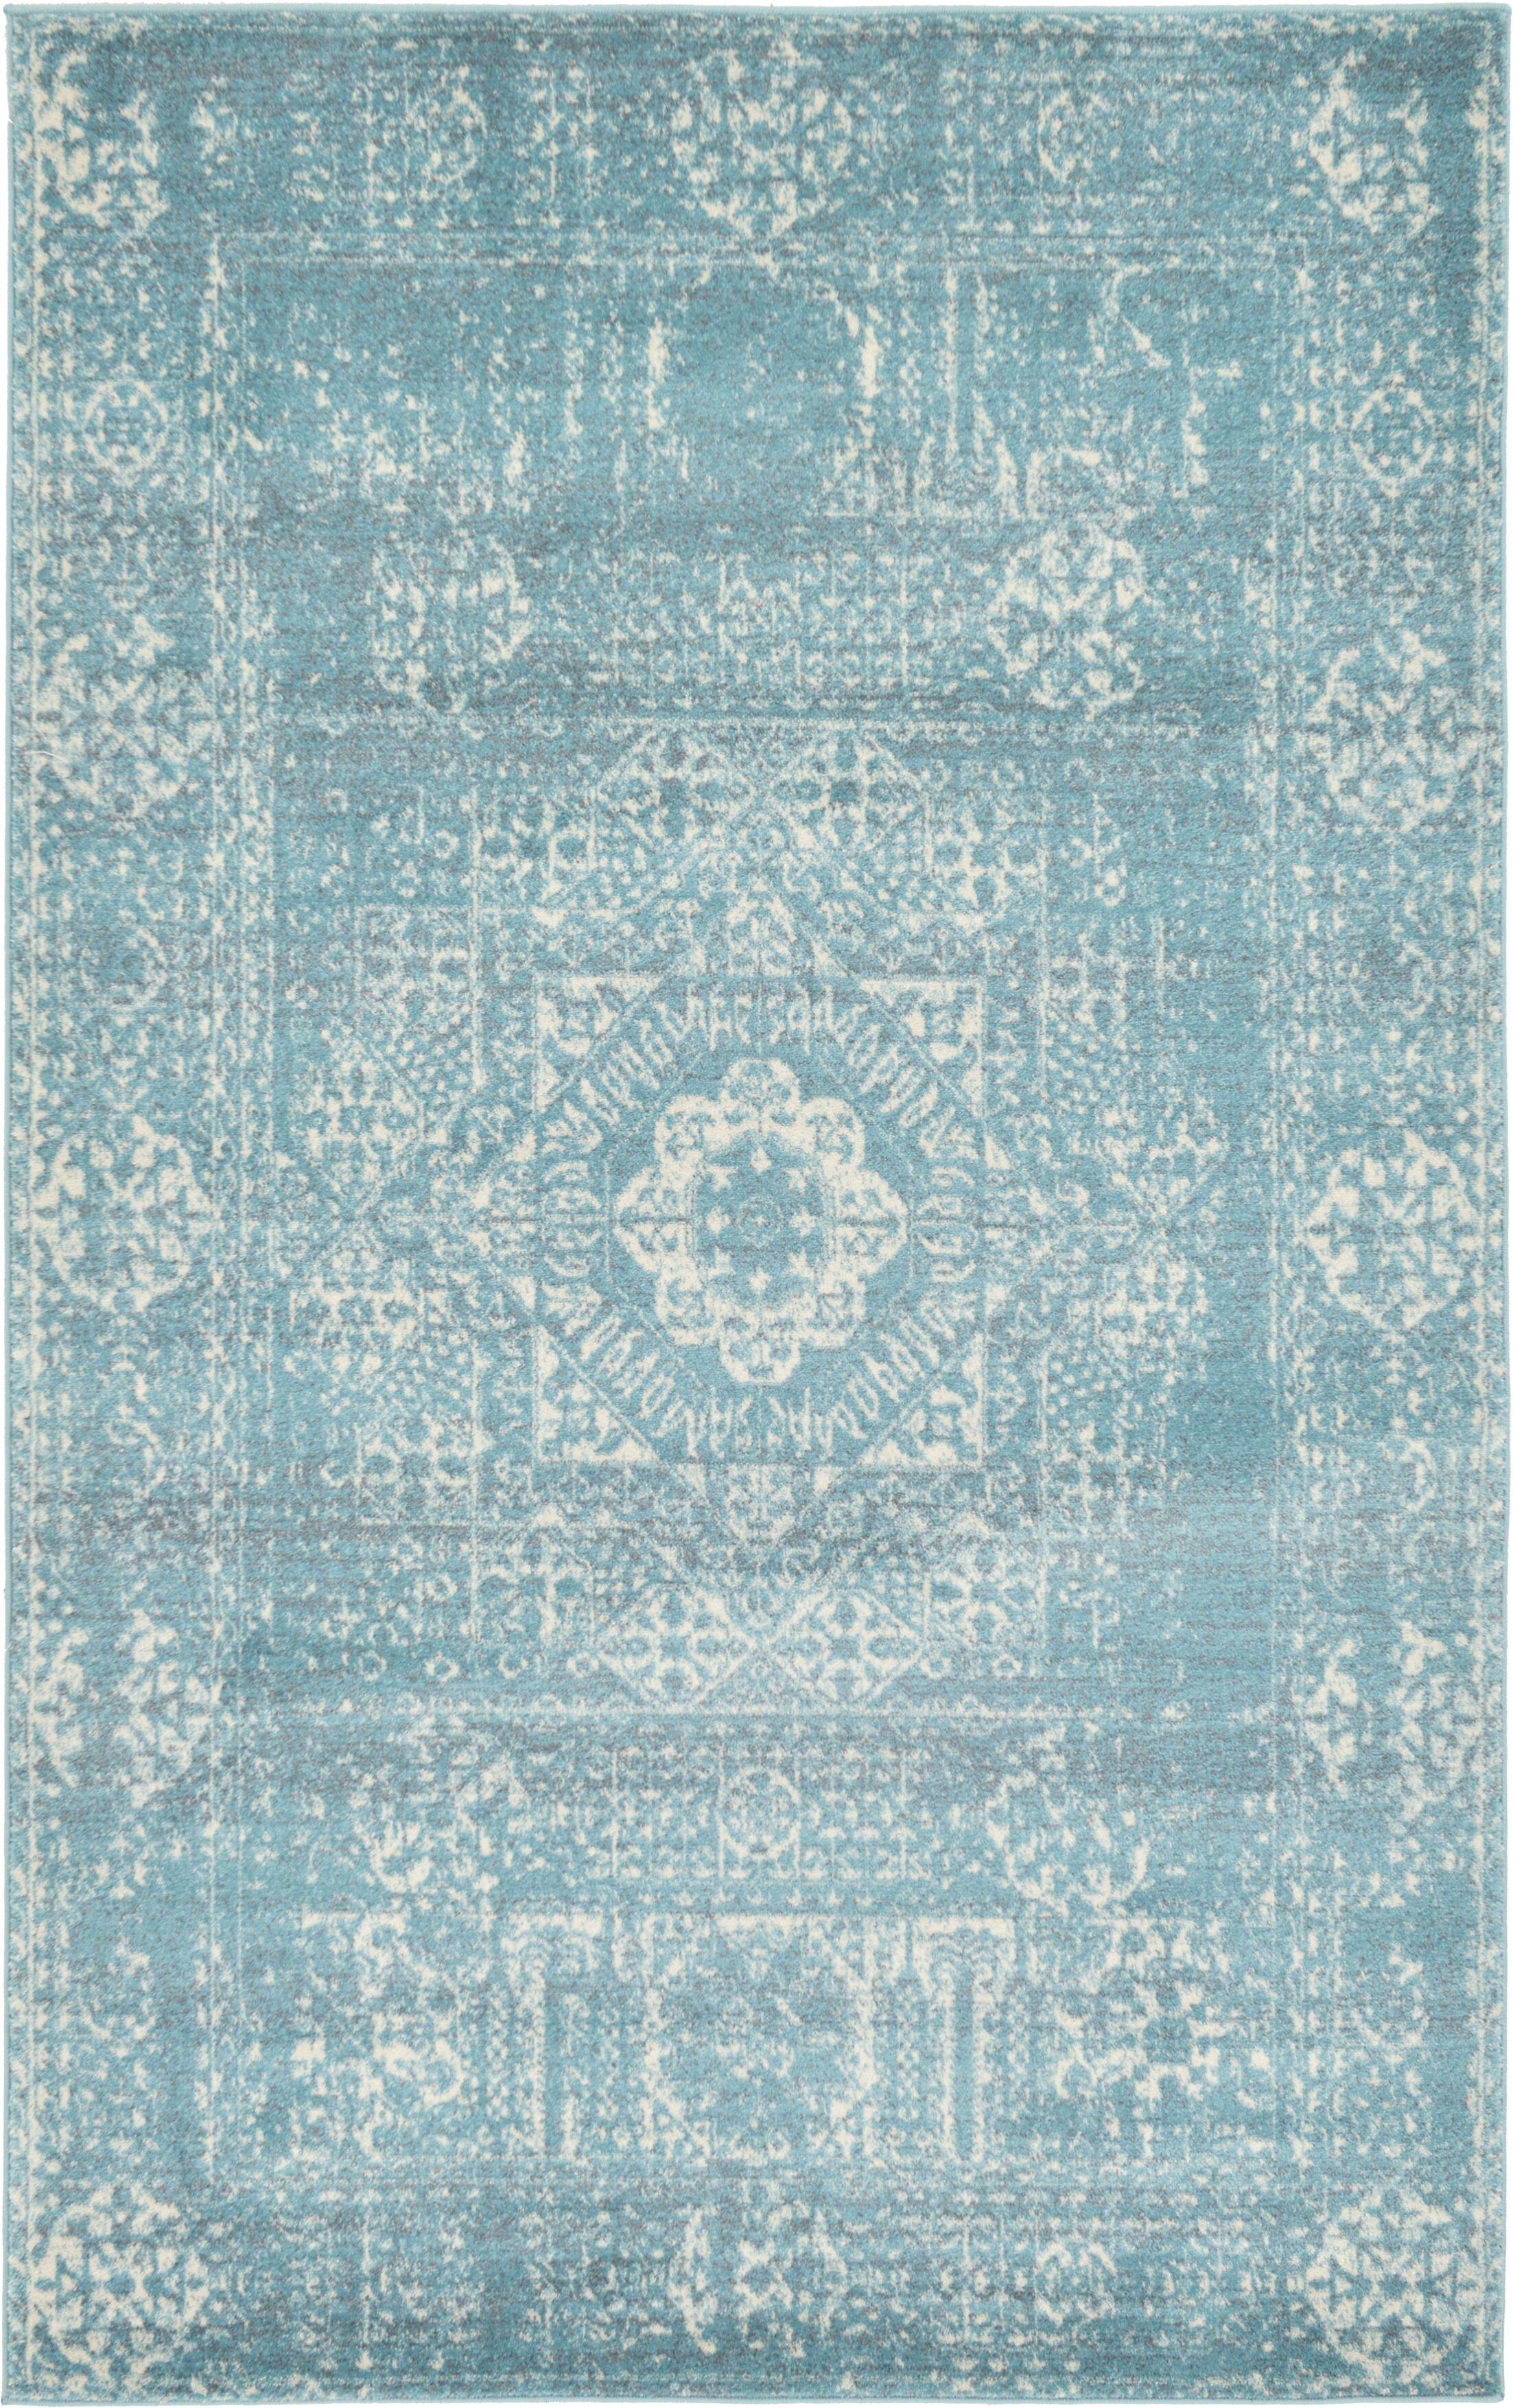 Delgado Brook Light Blue Area Rug Rug Size: Rectangle 5' x 8'